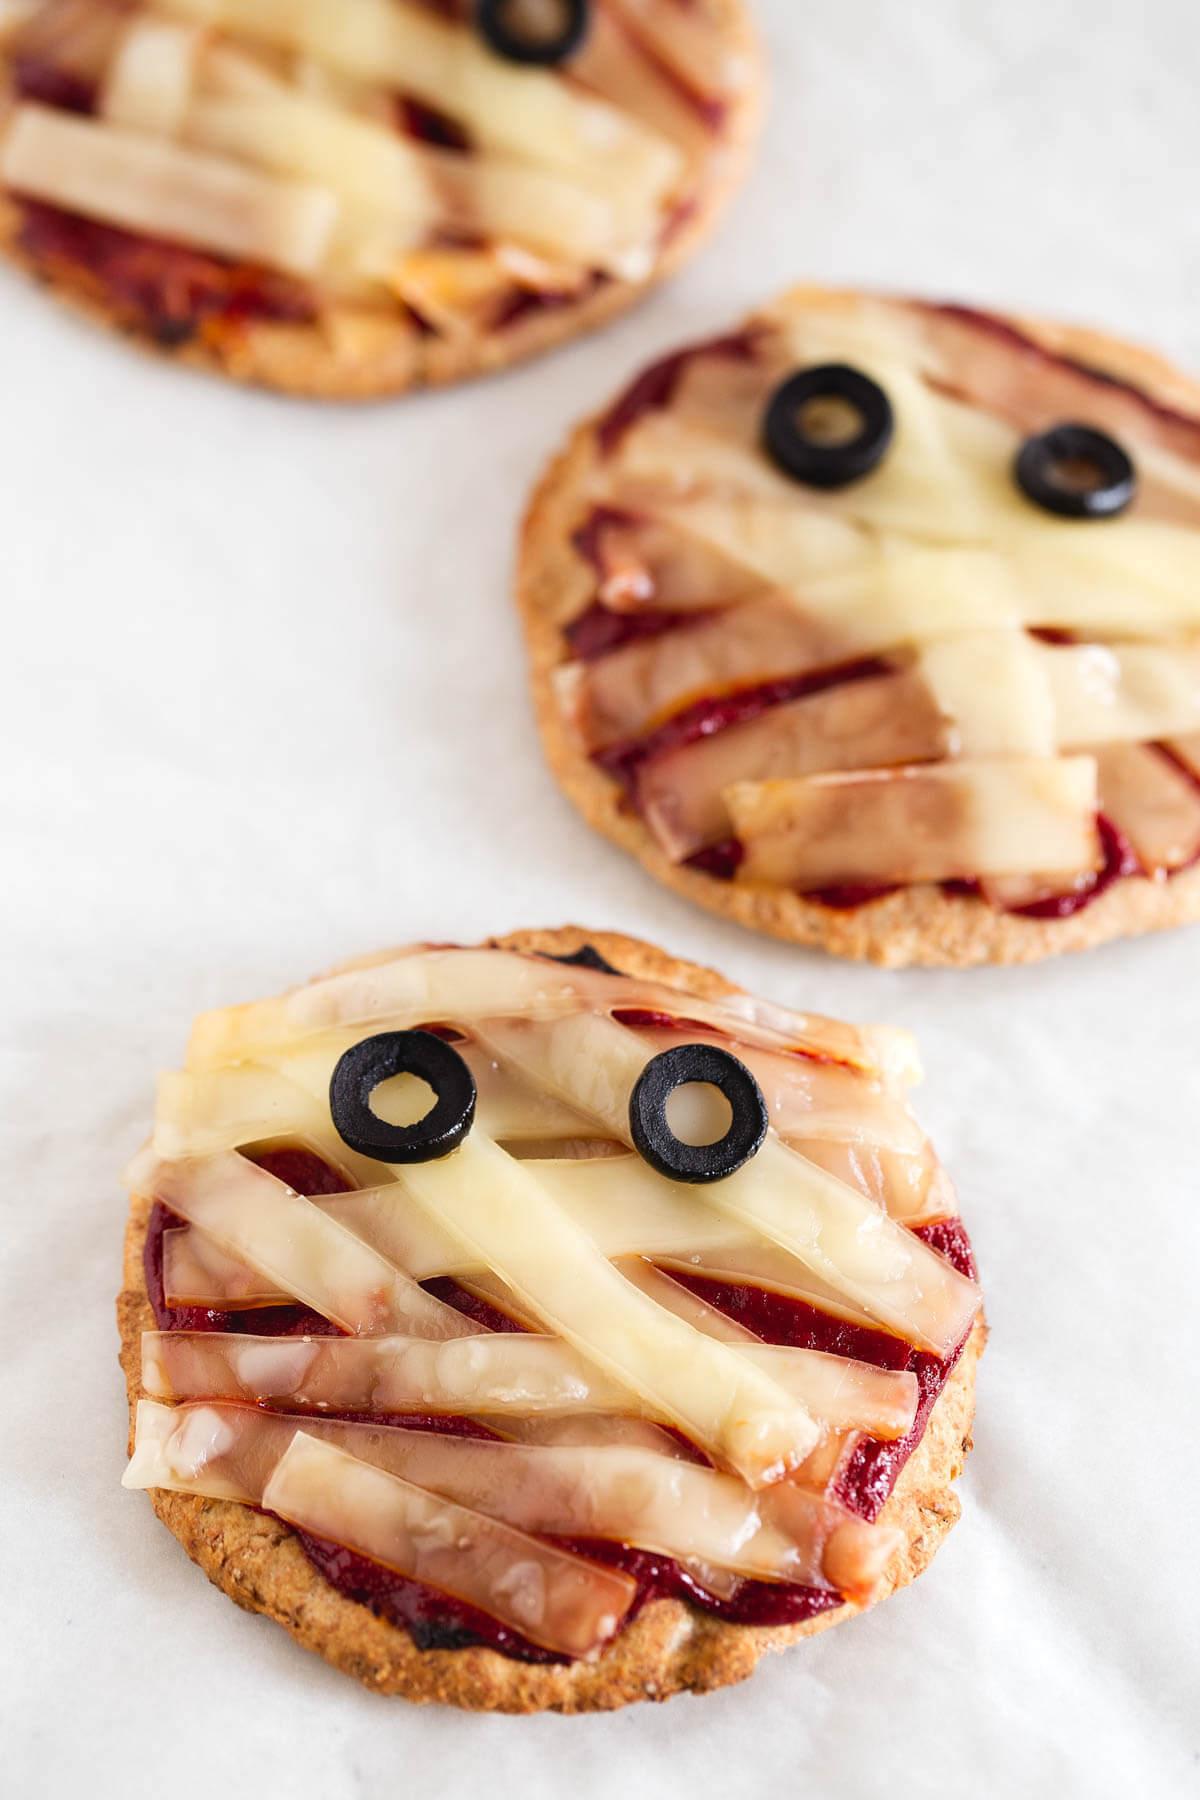 Halloween Recipe: Mini Vegan Mummy Pizzas - These vegan mini mummy pizzas are so easy to make. We have a homemade dough with spelt flour; it is a vibrant, healthy alternative.